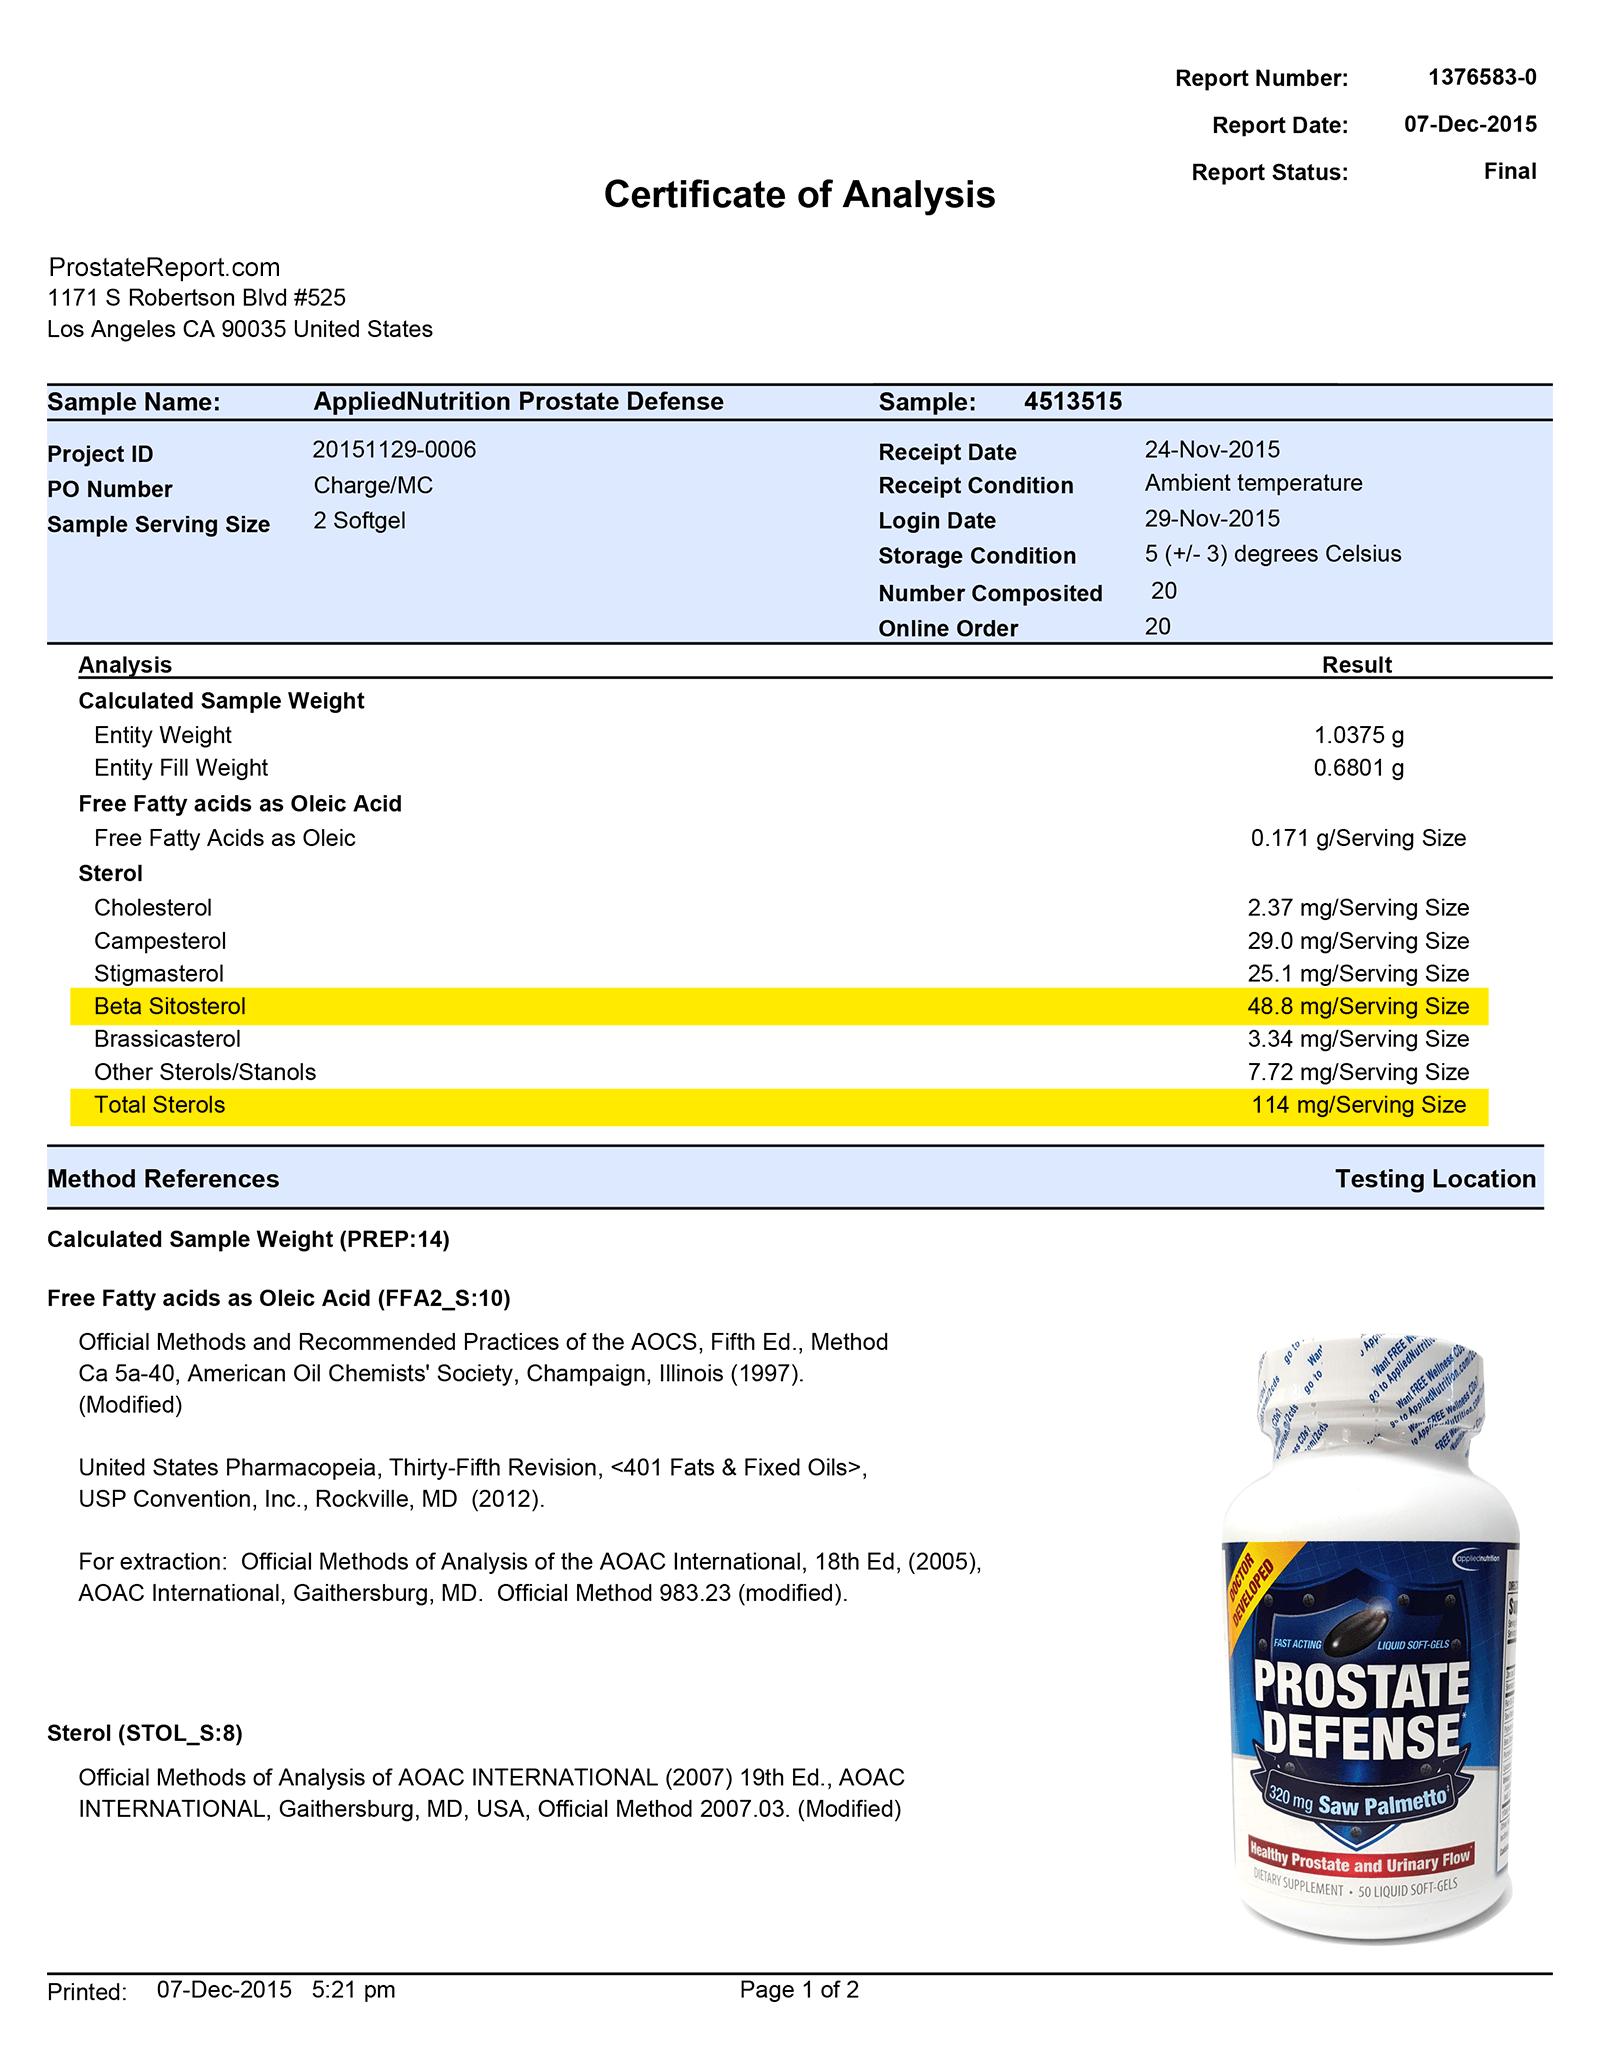 Prostate Defense lab report